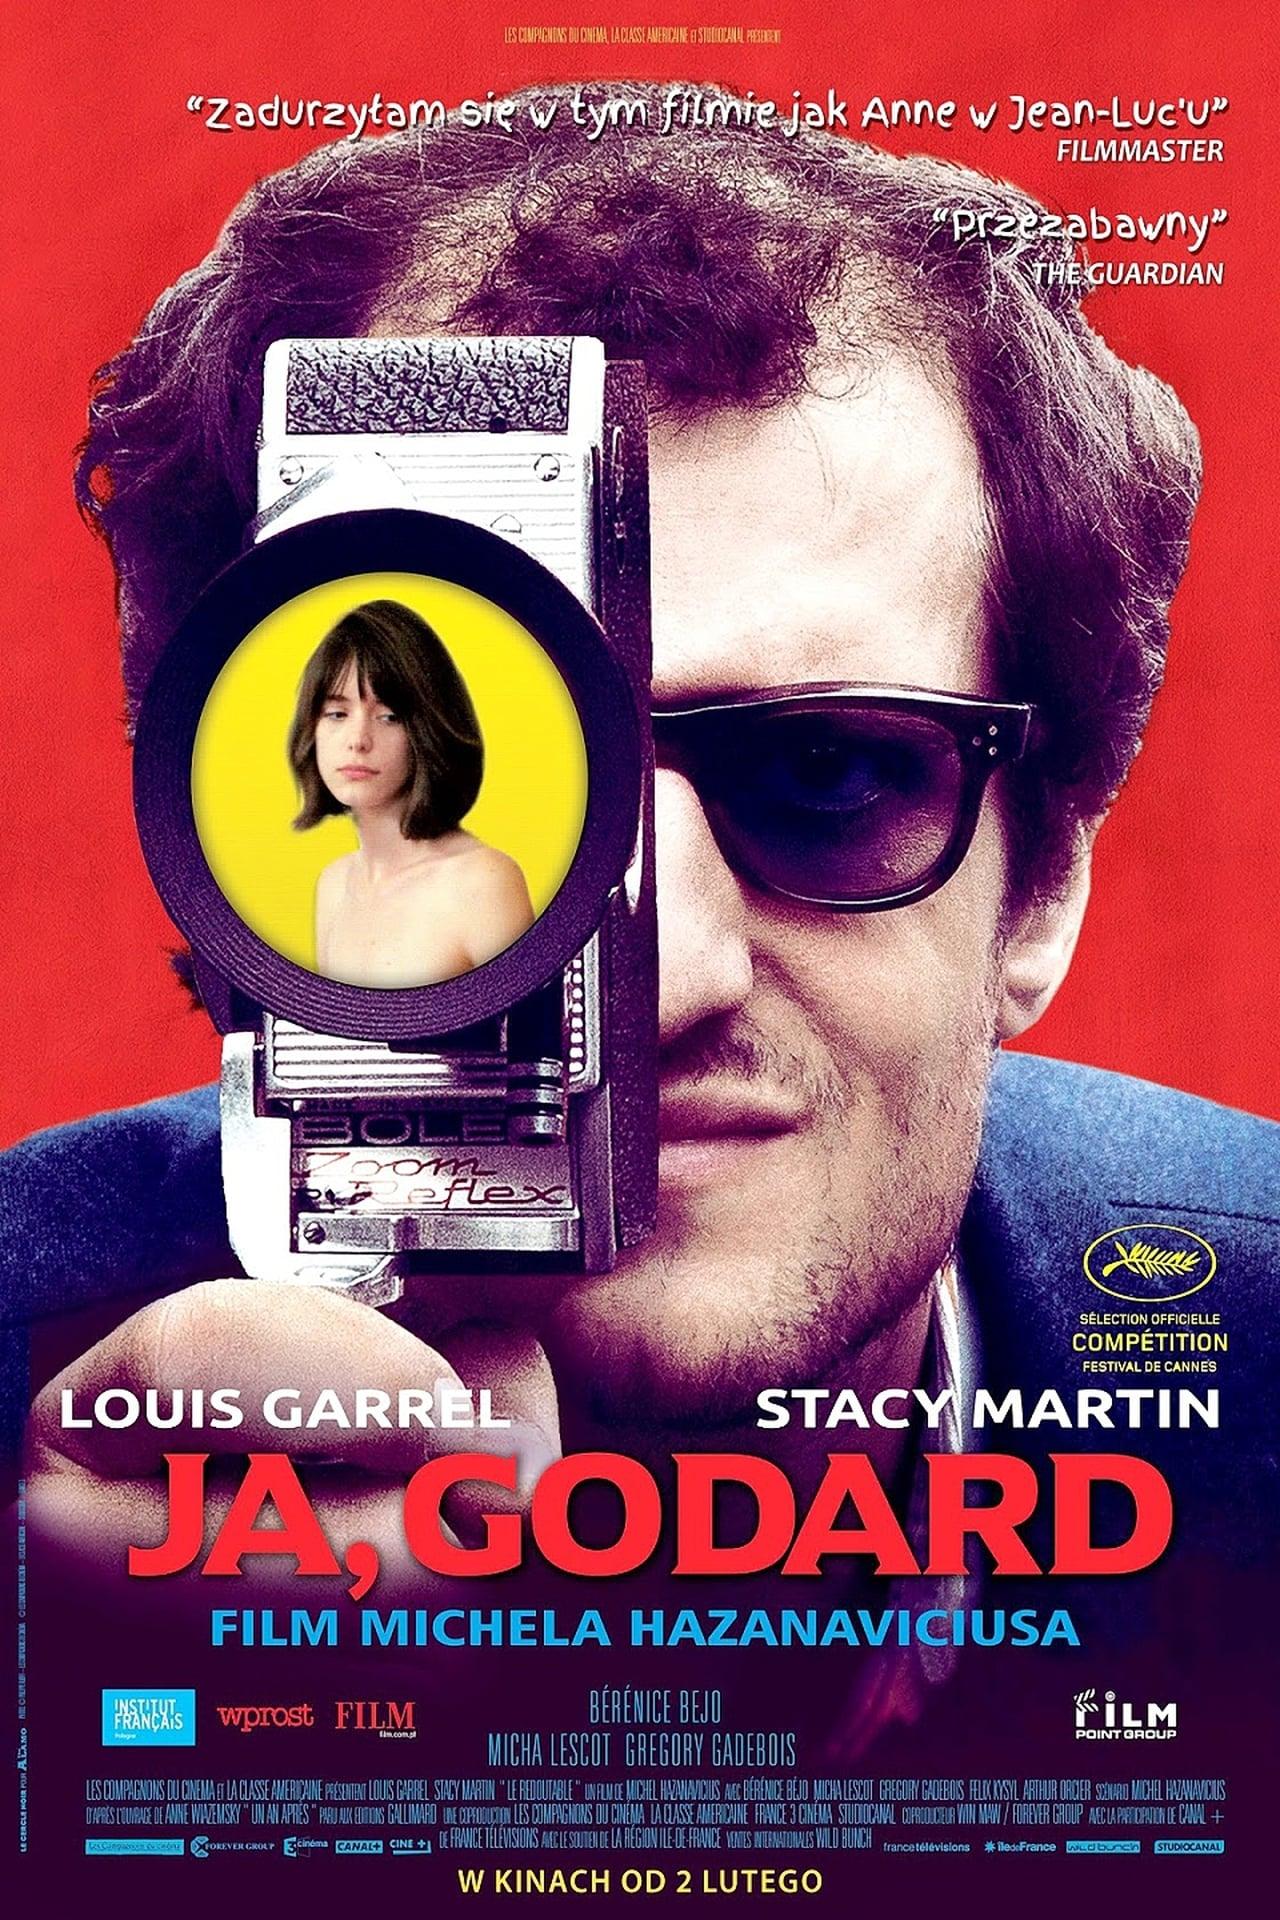 watch godard mon amour online free